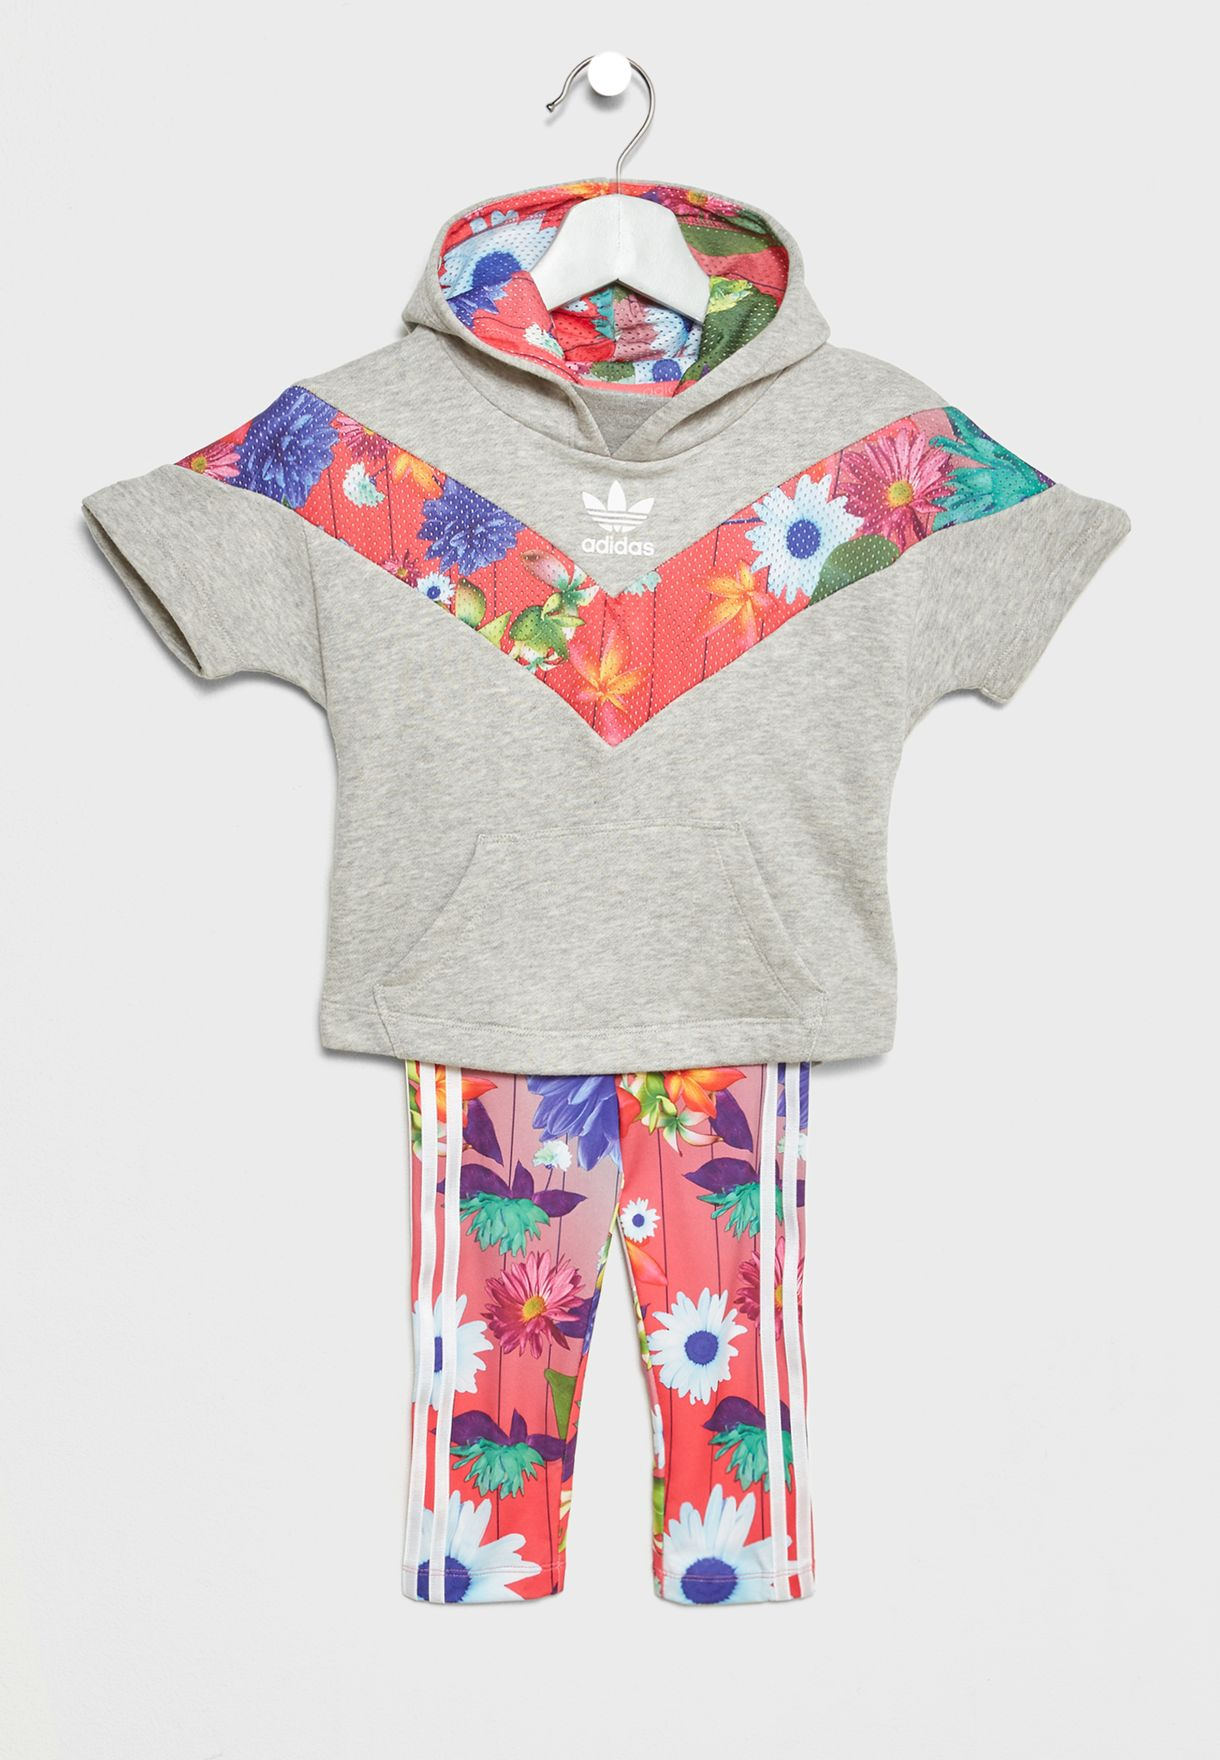 d6e15e0ae7d41 Shop adidas Originals multicolor Infant Graphic Hoodie+Leggings Set ...